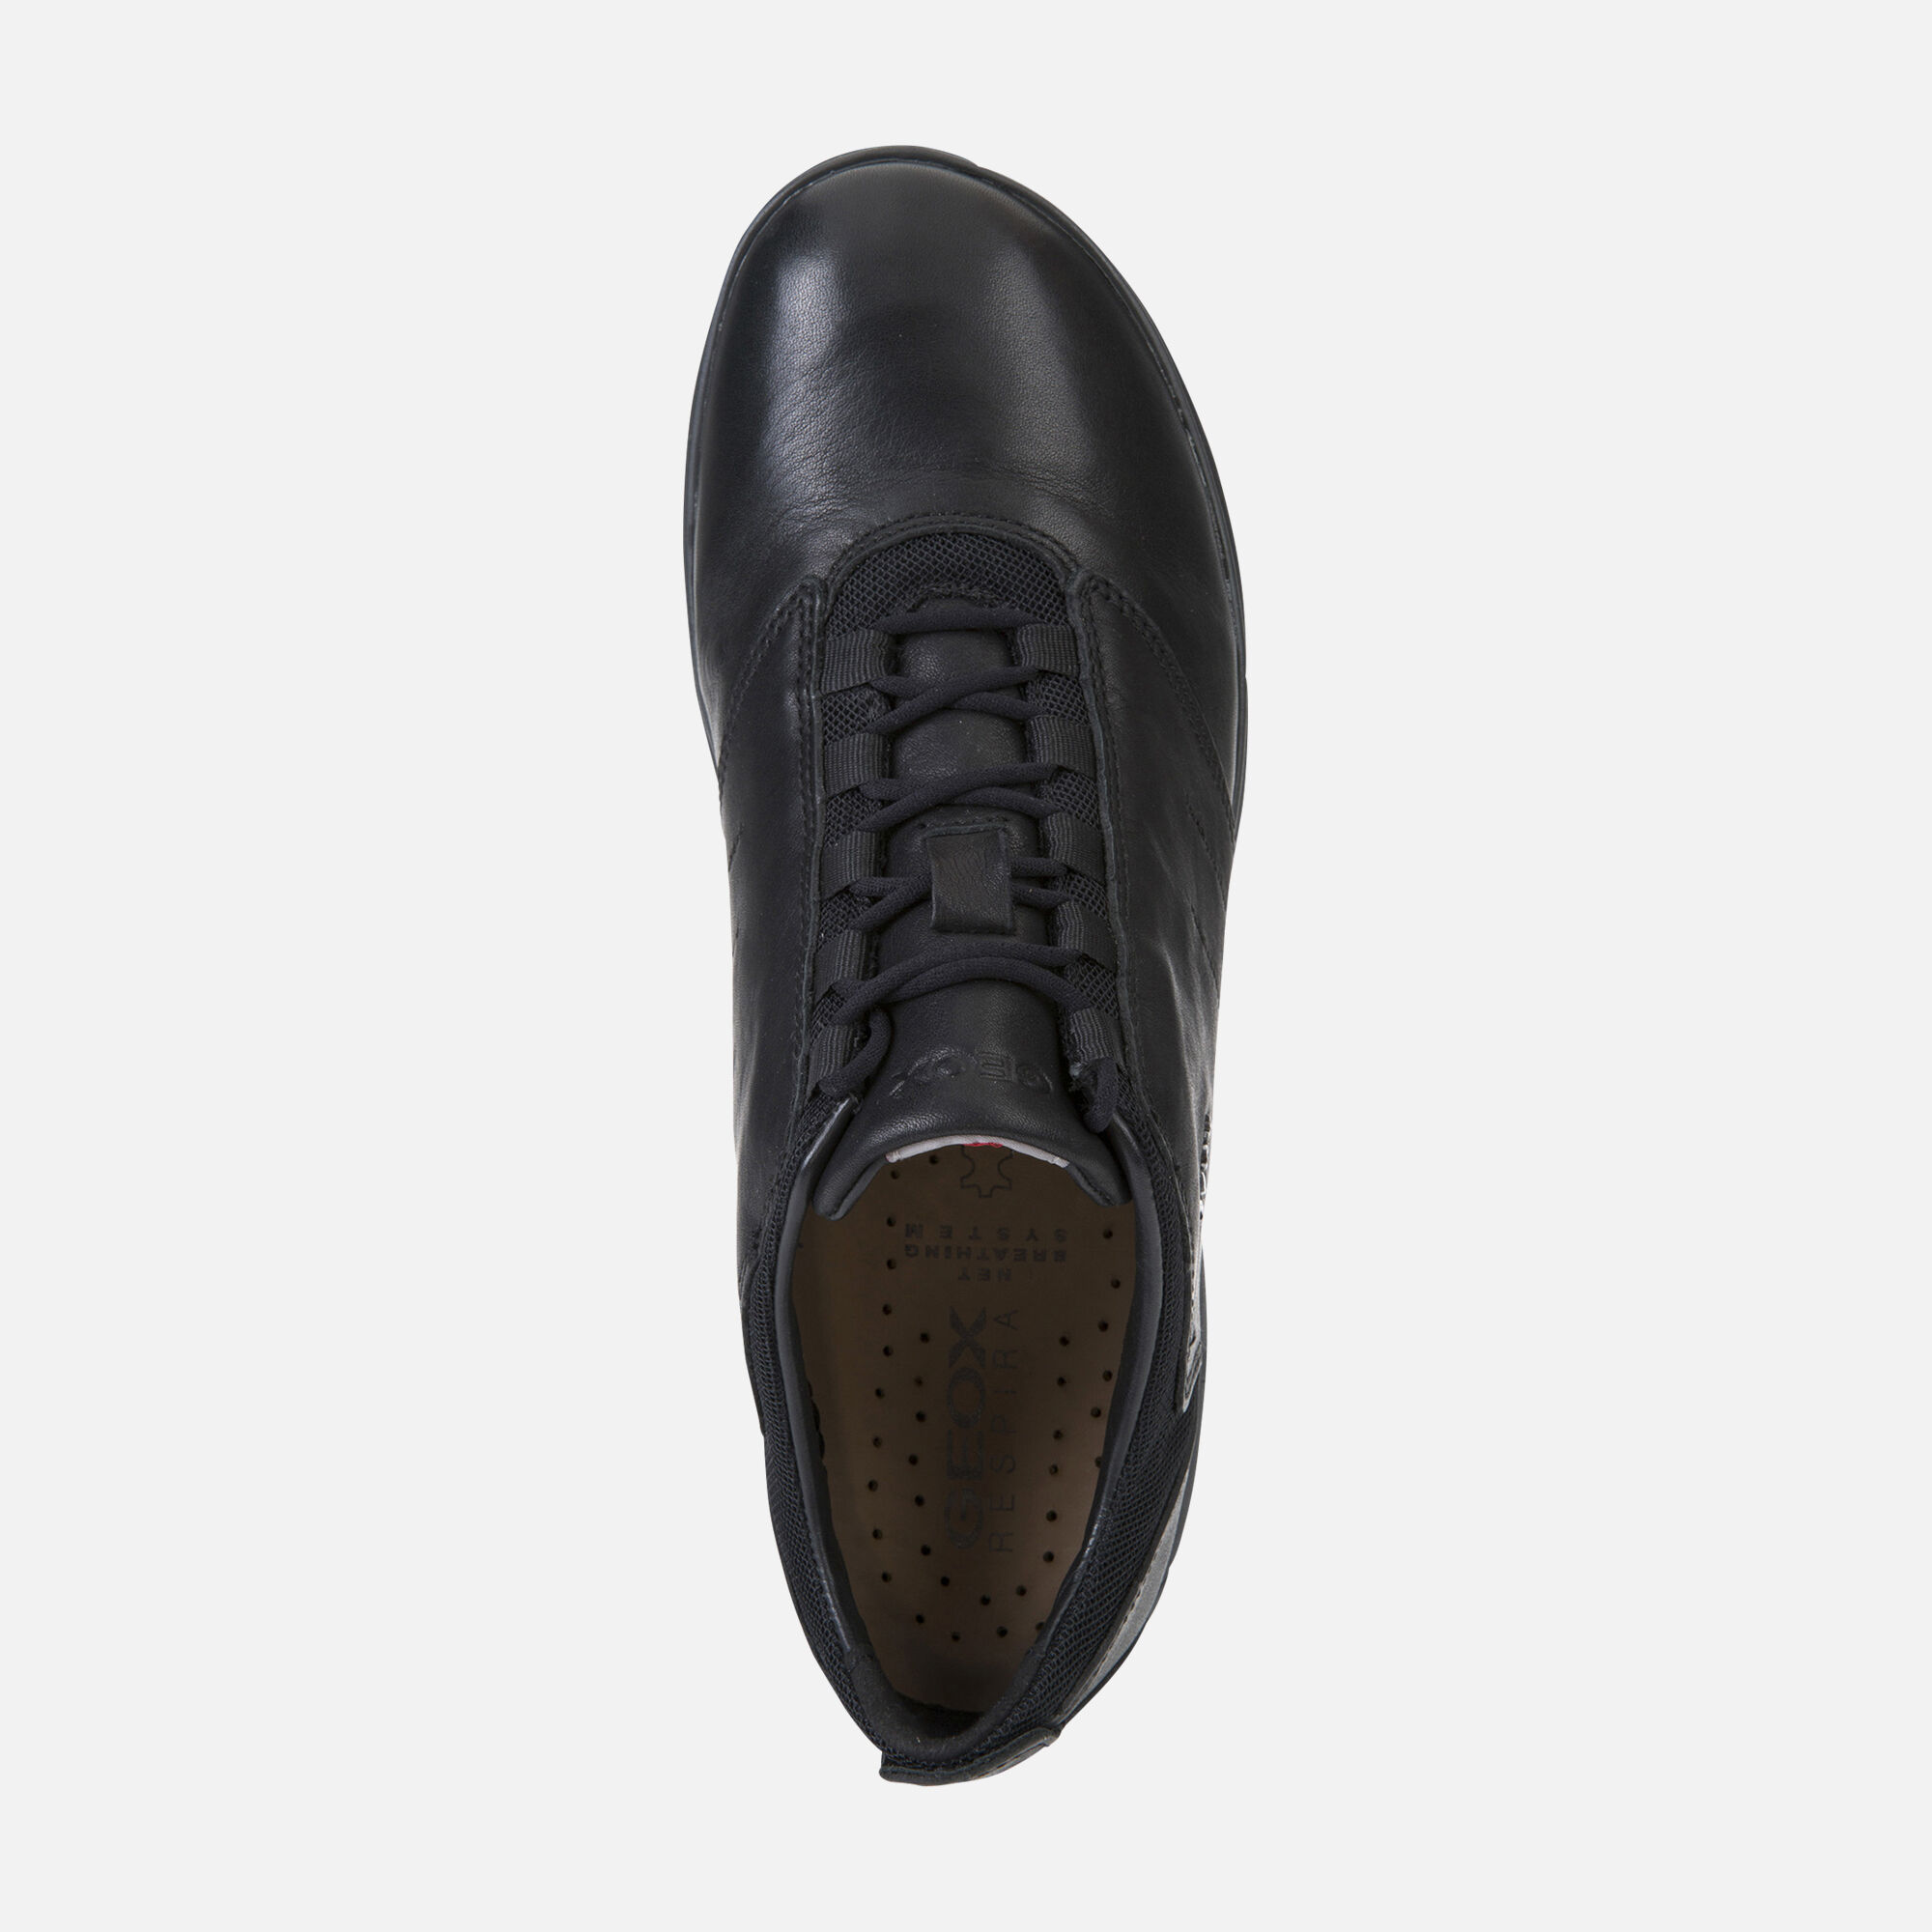 Geox NEBULA Man Black Sneakers   Geox SS20